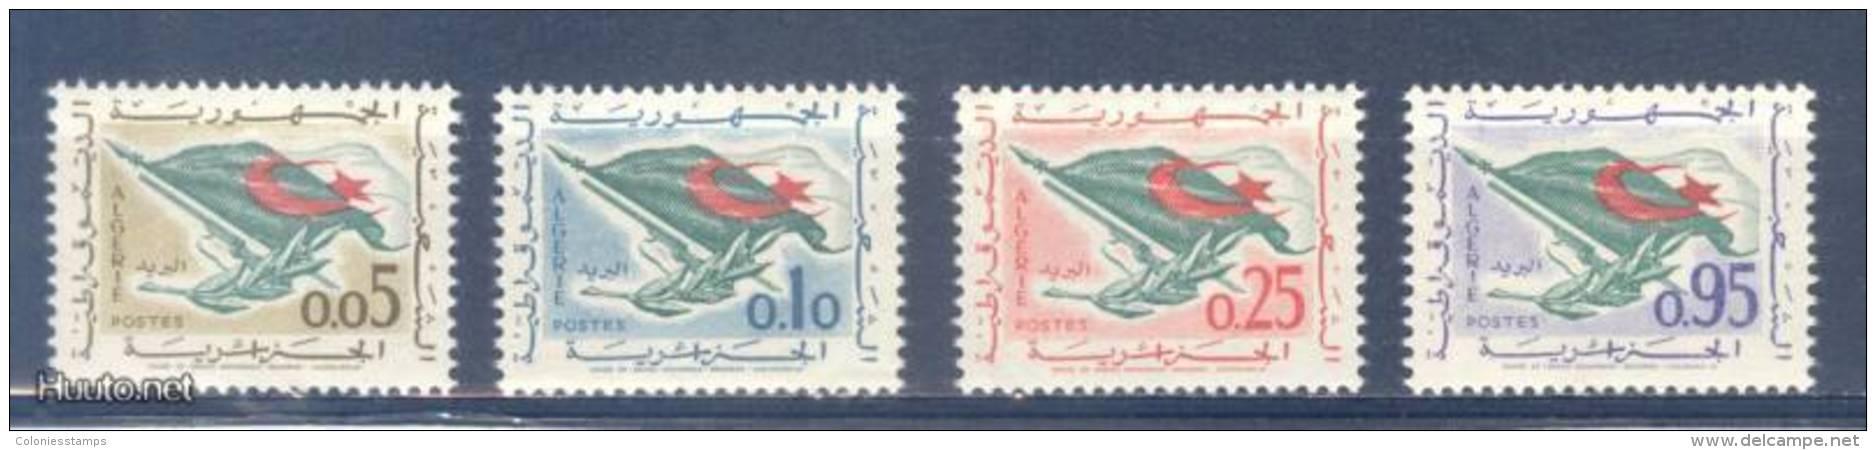 (S0483) ALGERIA, 1963 (Definitives. National Flag). Mi ## 394-397. MNH** - Algérie (1962-...)